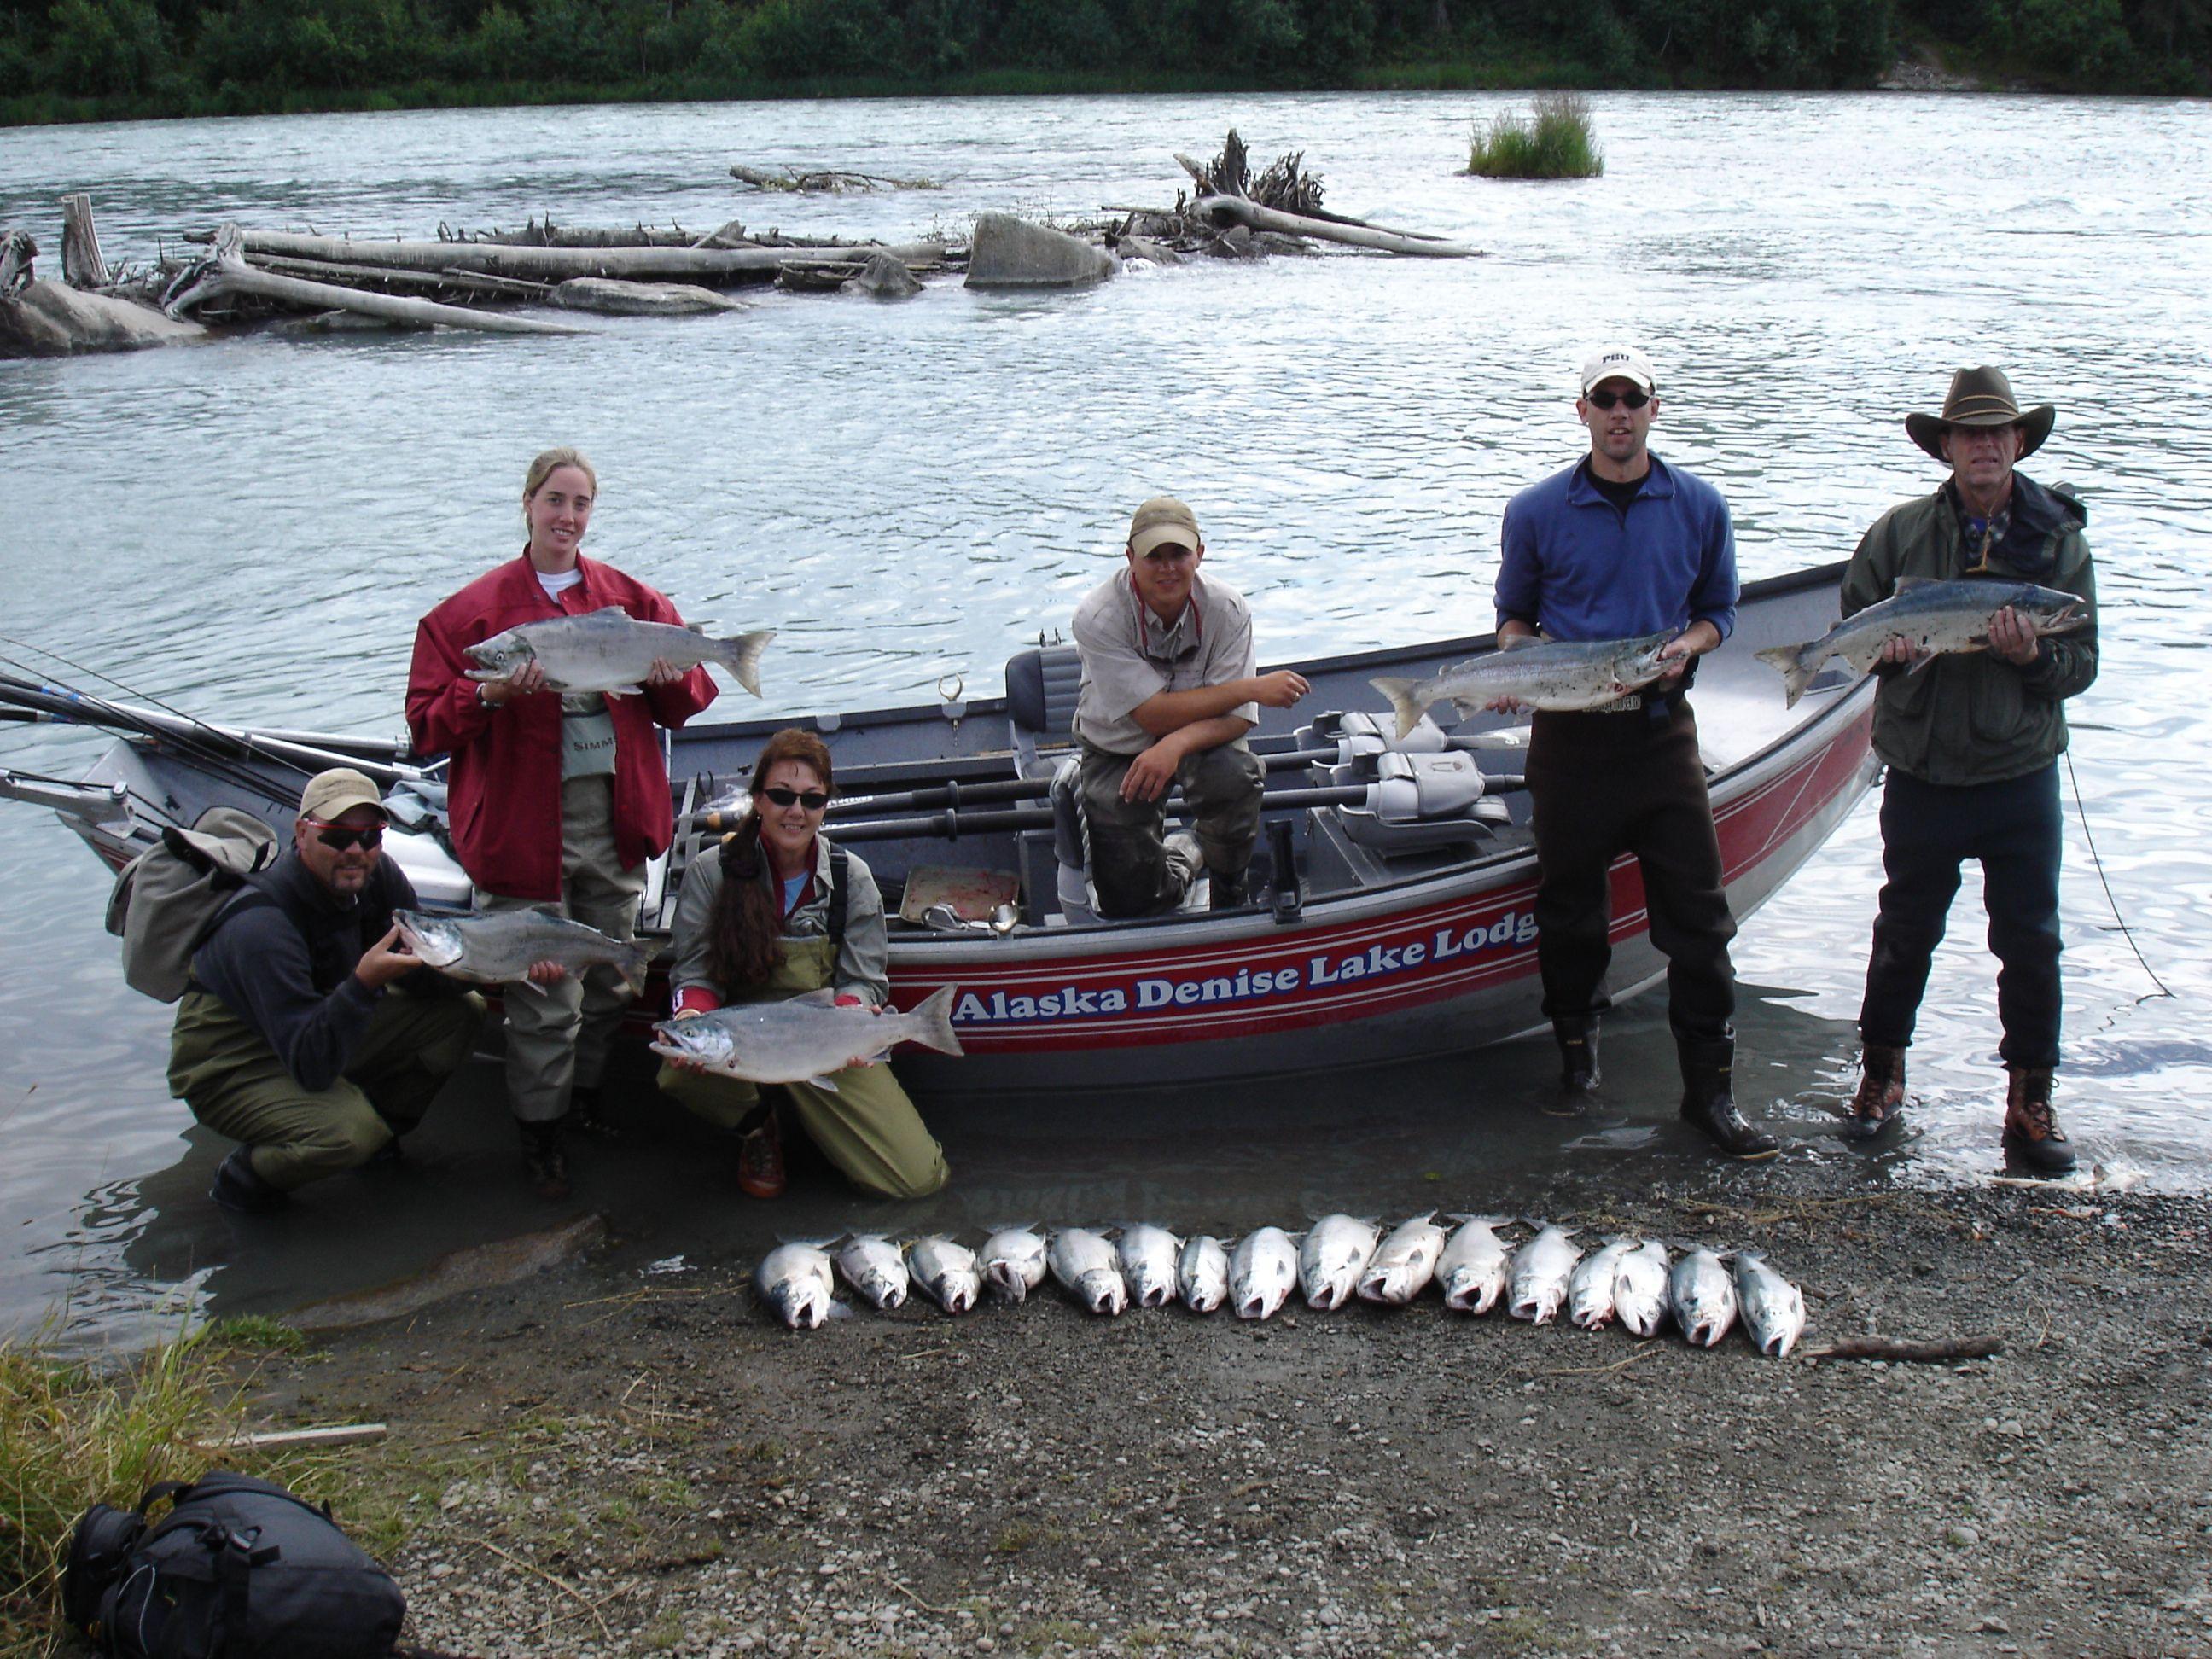 New All Inclusive Fishing Vacation Packages E E Alaska Salmon - Alaska all inclusive